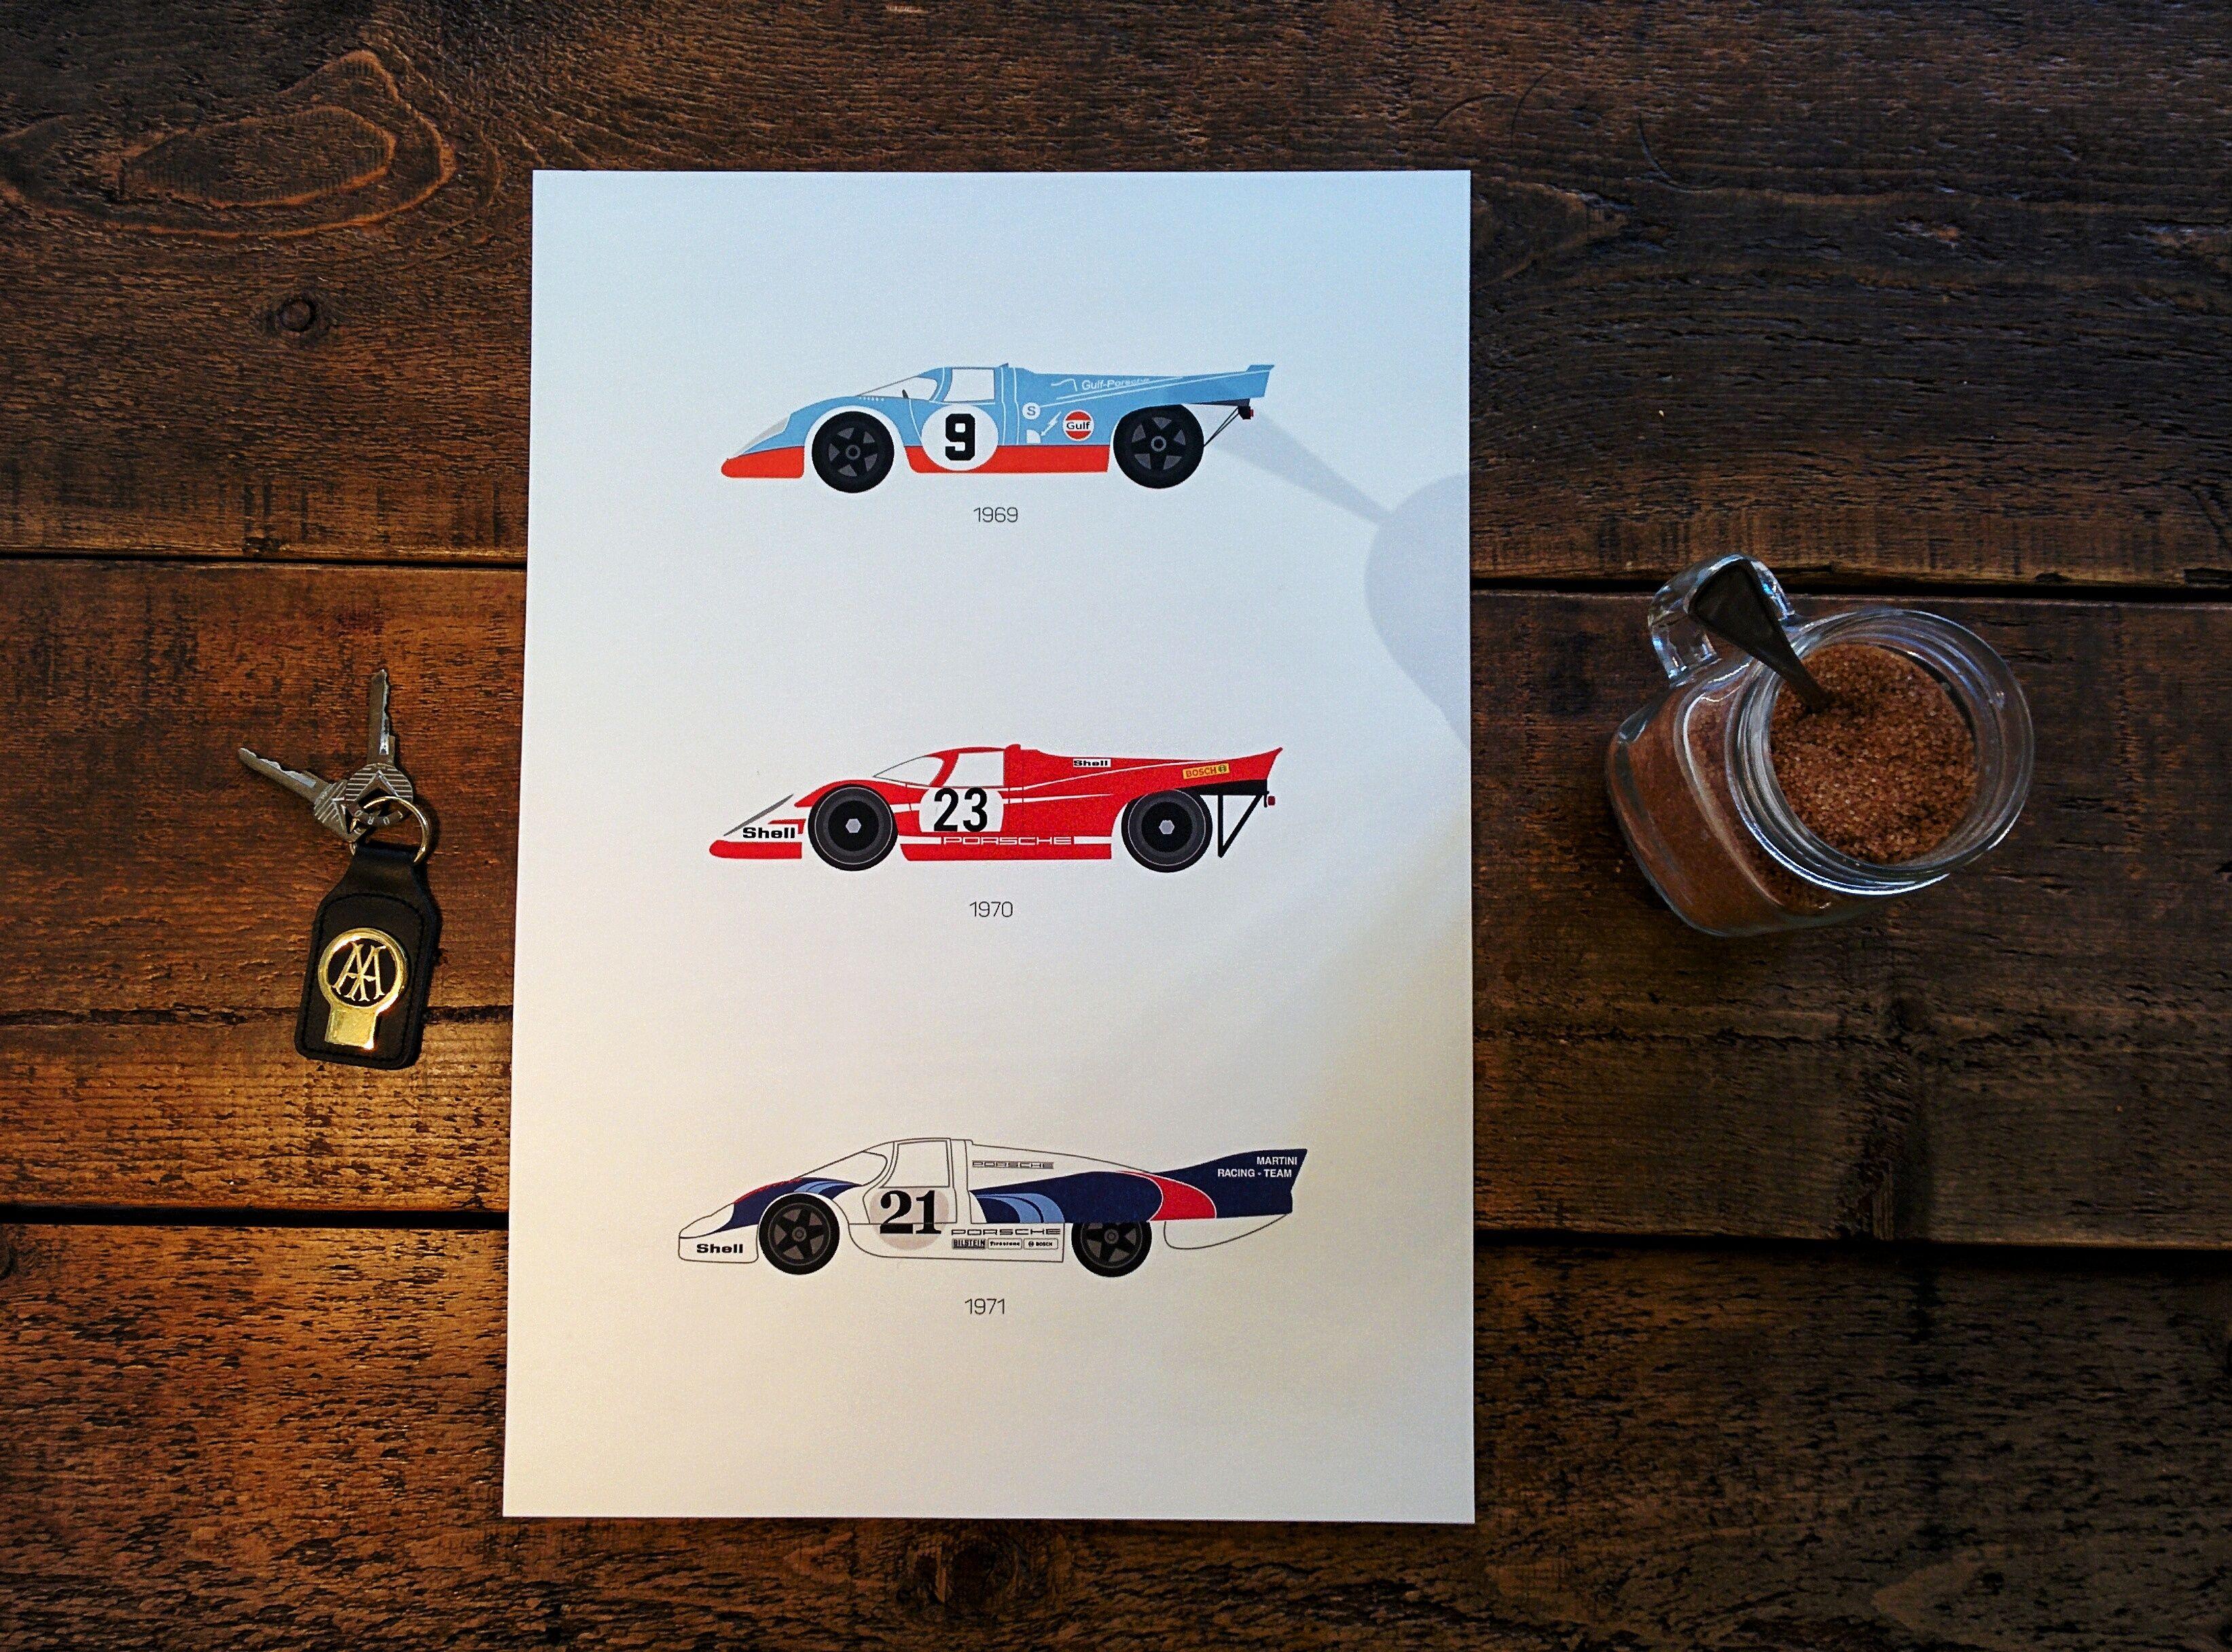 Chariots of Champions #Porsche #porsche911 #porschelife #cayenne #cars #car